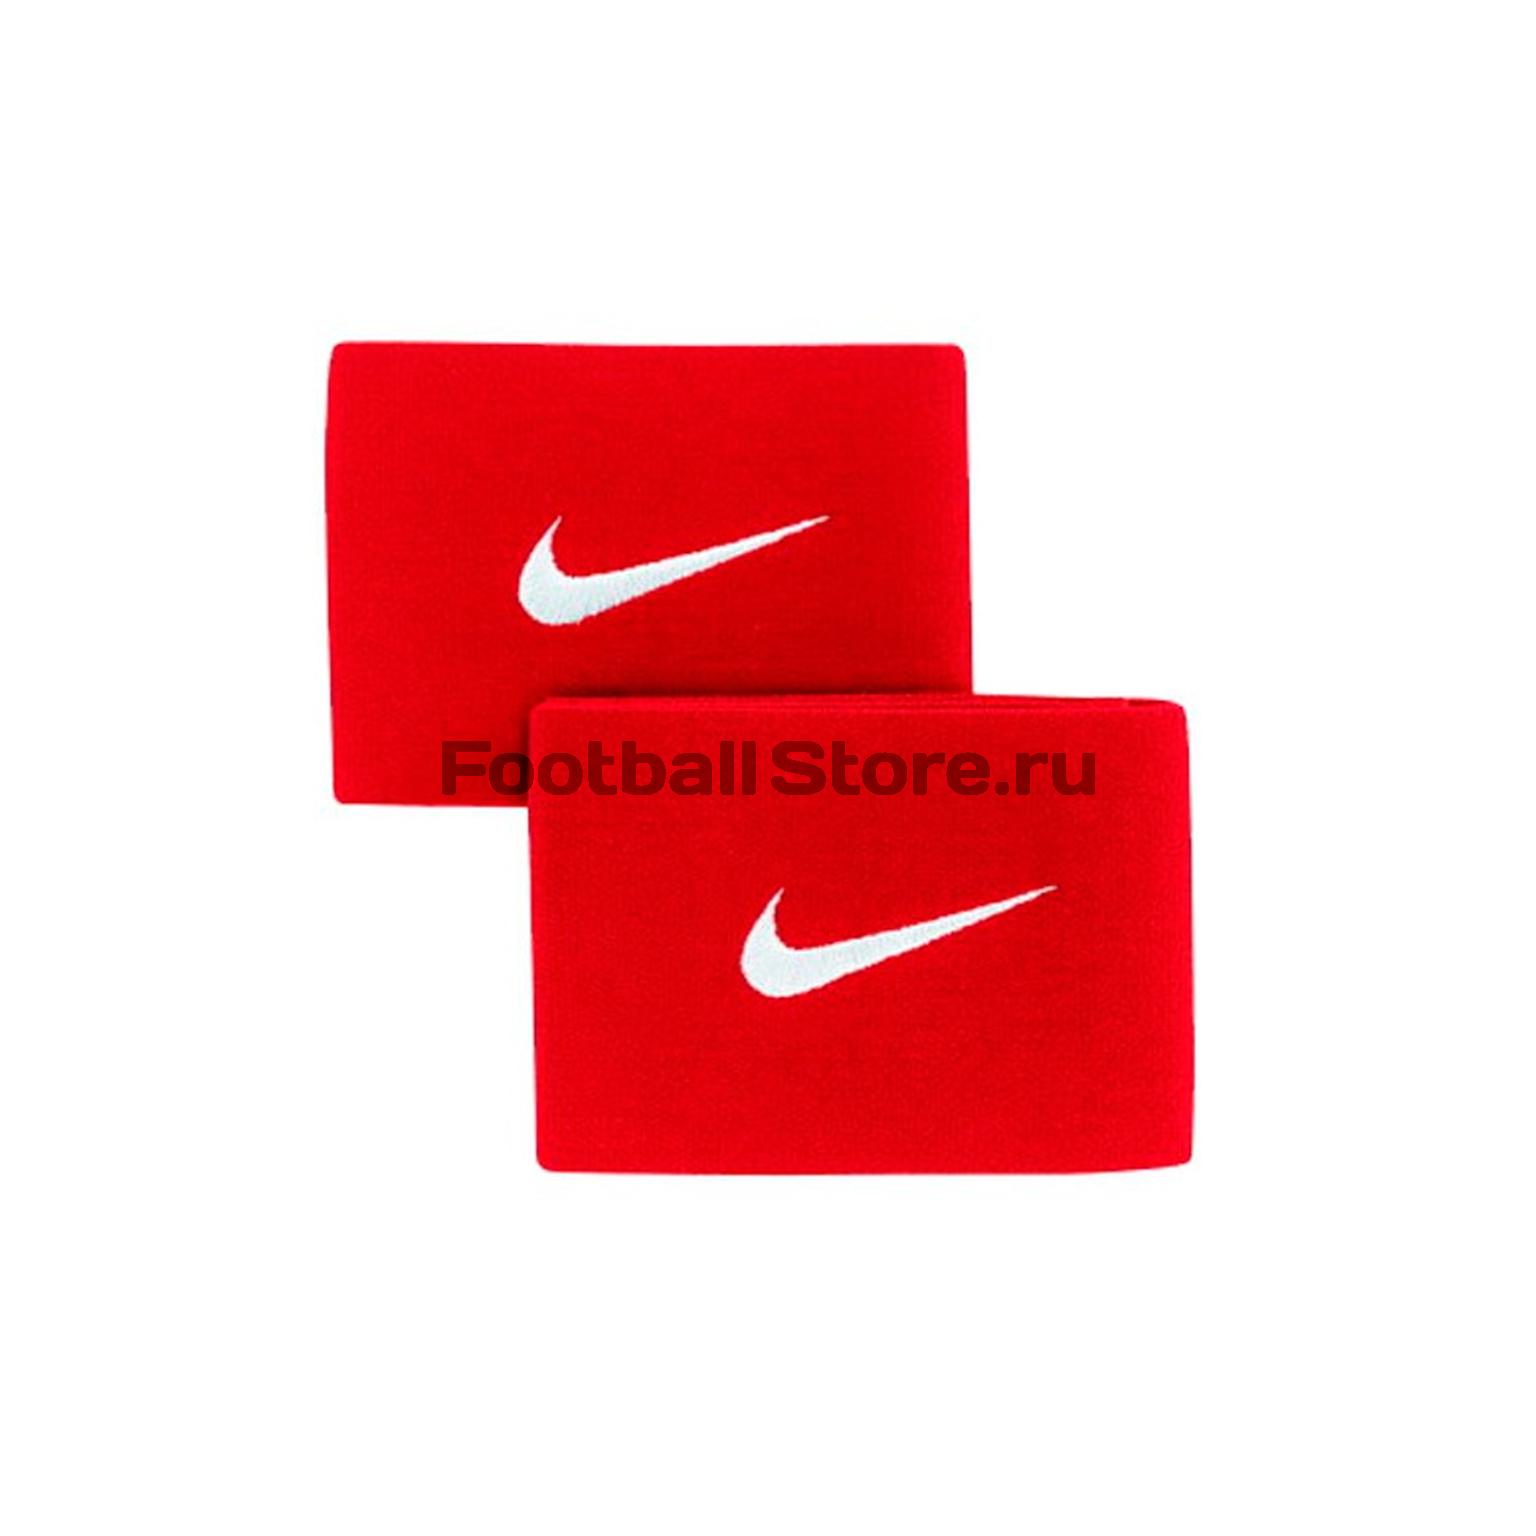 Повязка для фиксации щитка Nike SE0047-610 rsac 2018 07 07t20 00